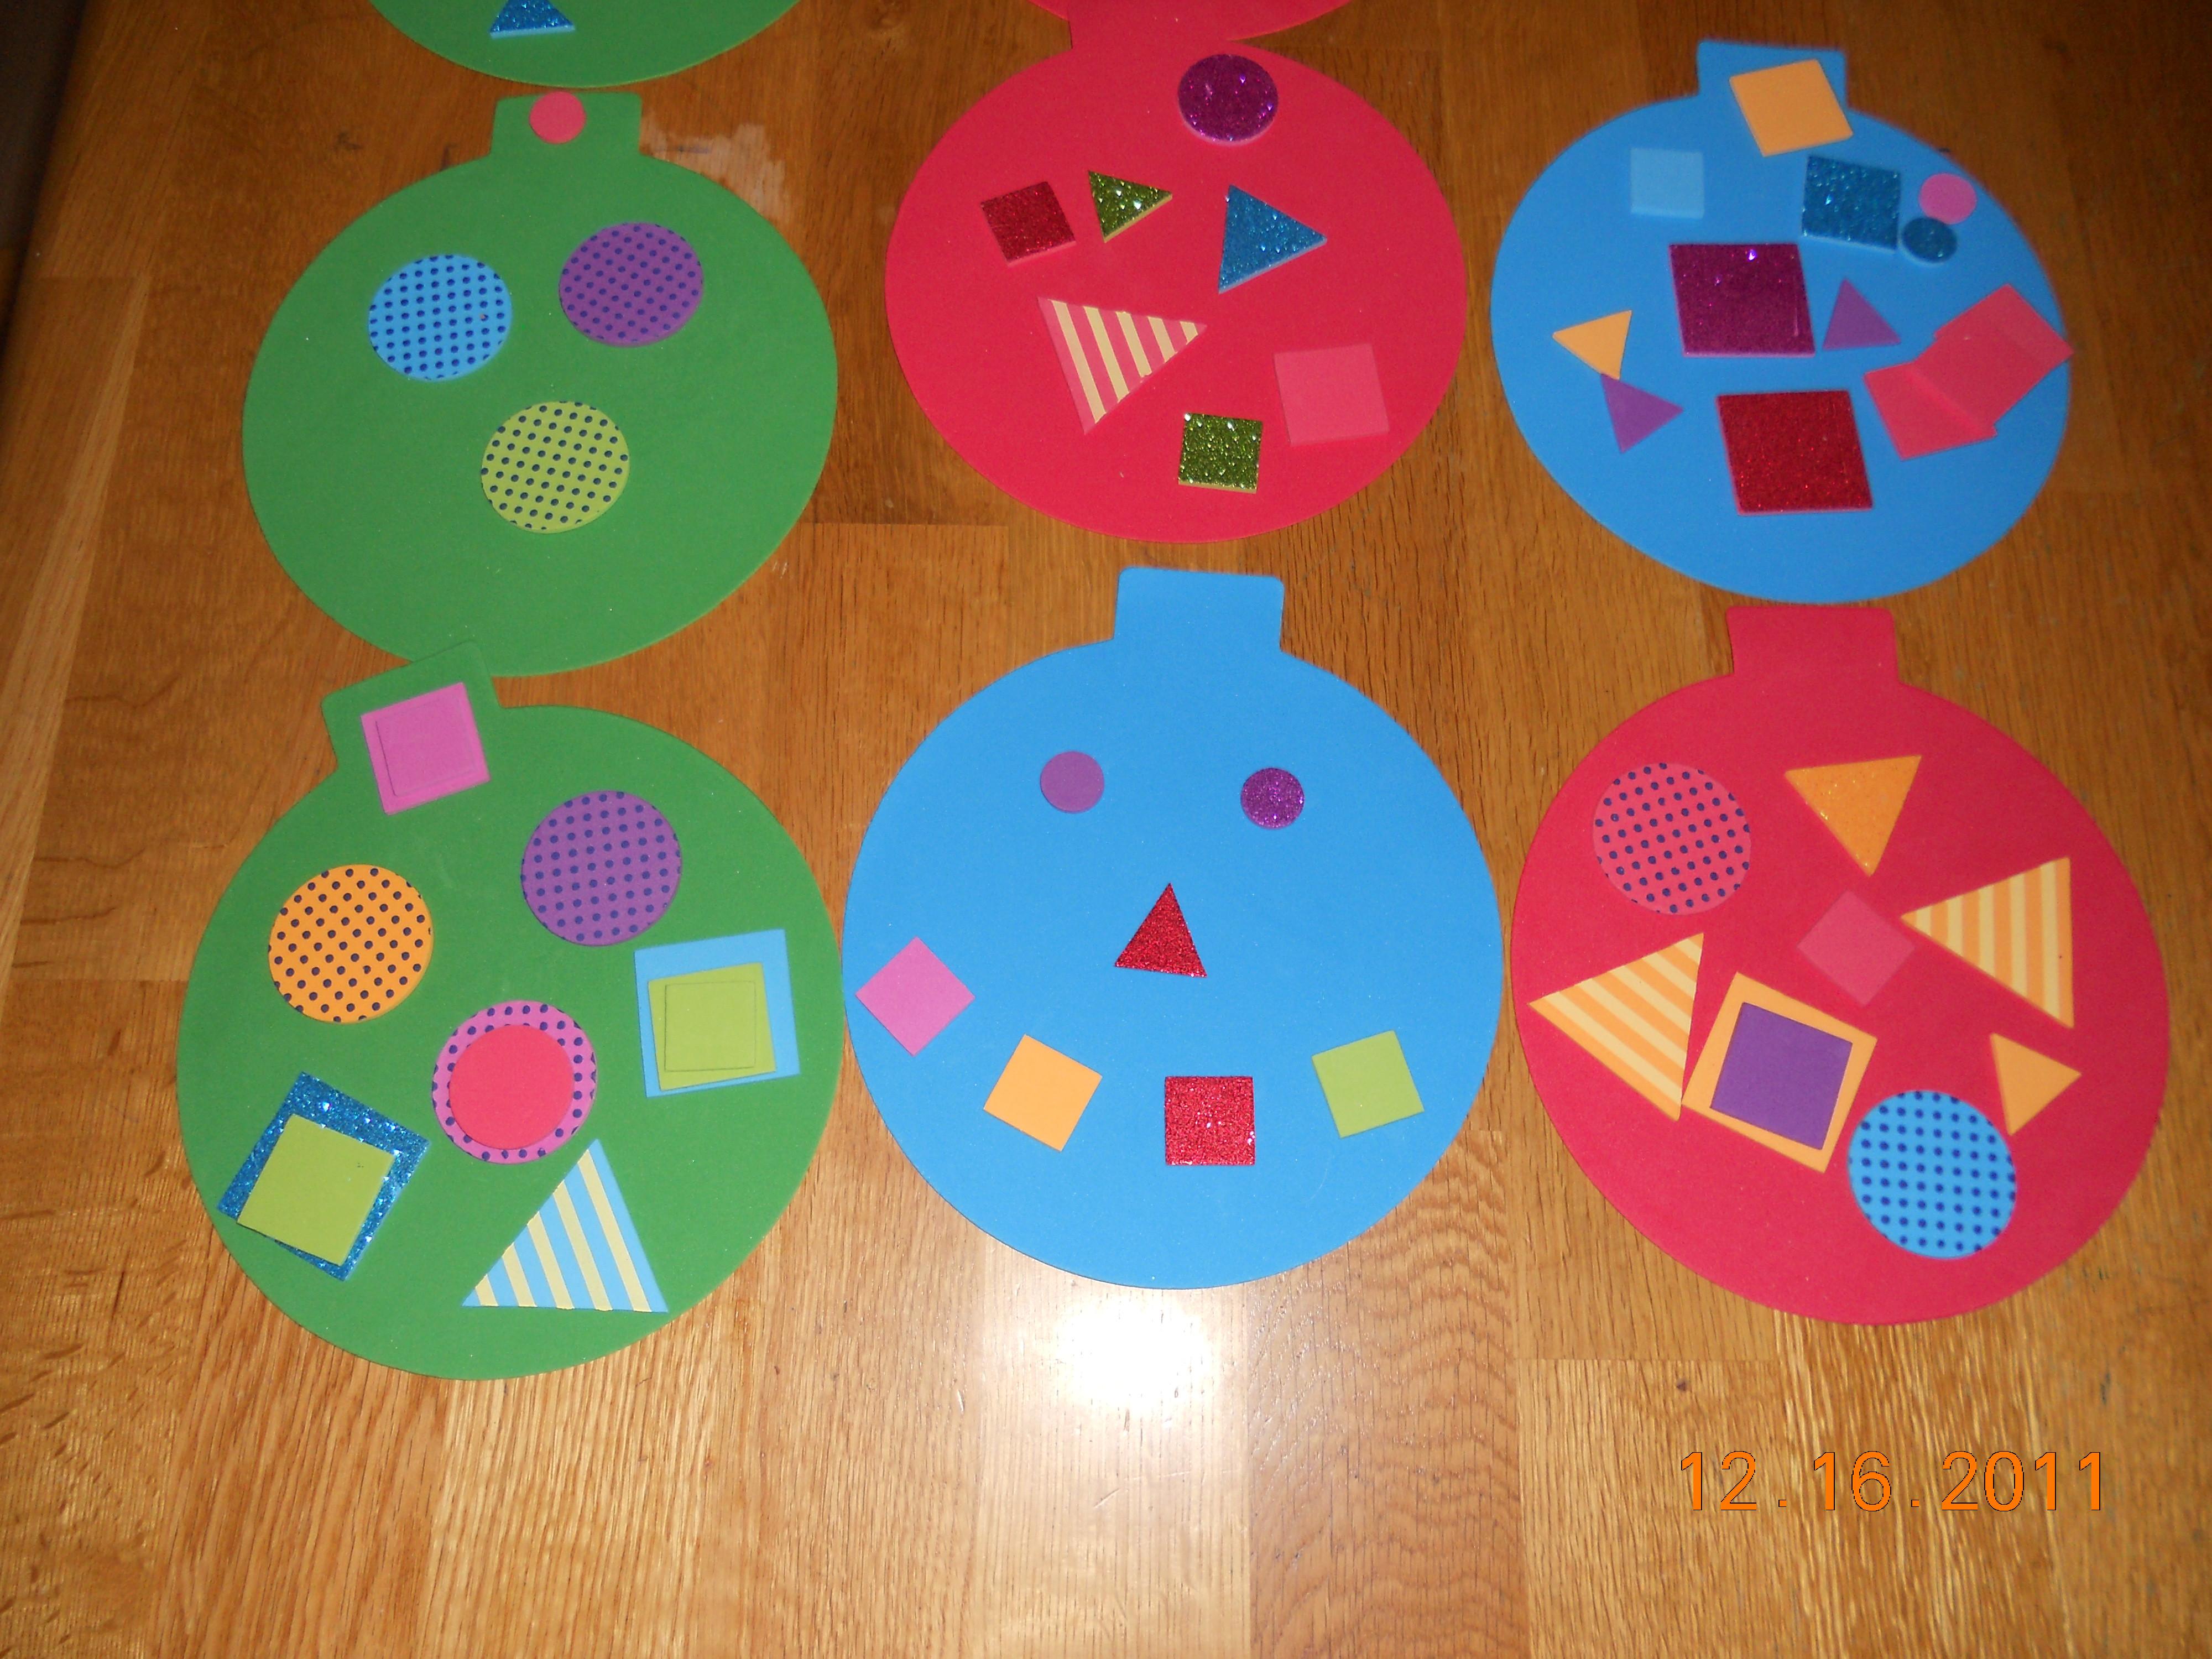 Preschool Christmas Ornament Craft Ideas  15 Fun and Easy Christmas Craft Ideas for Kids – Miss Lassy